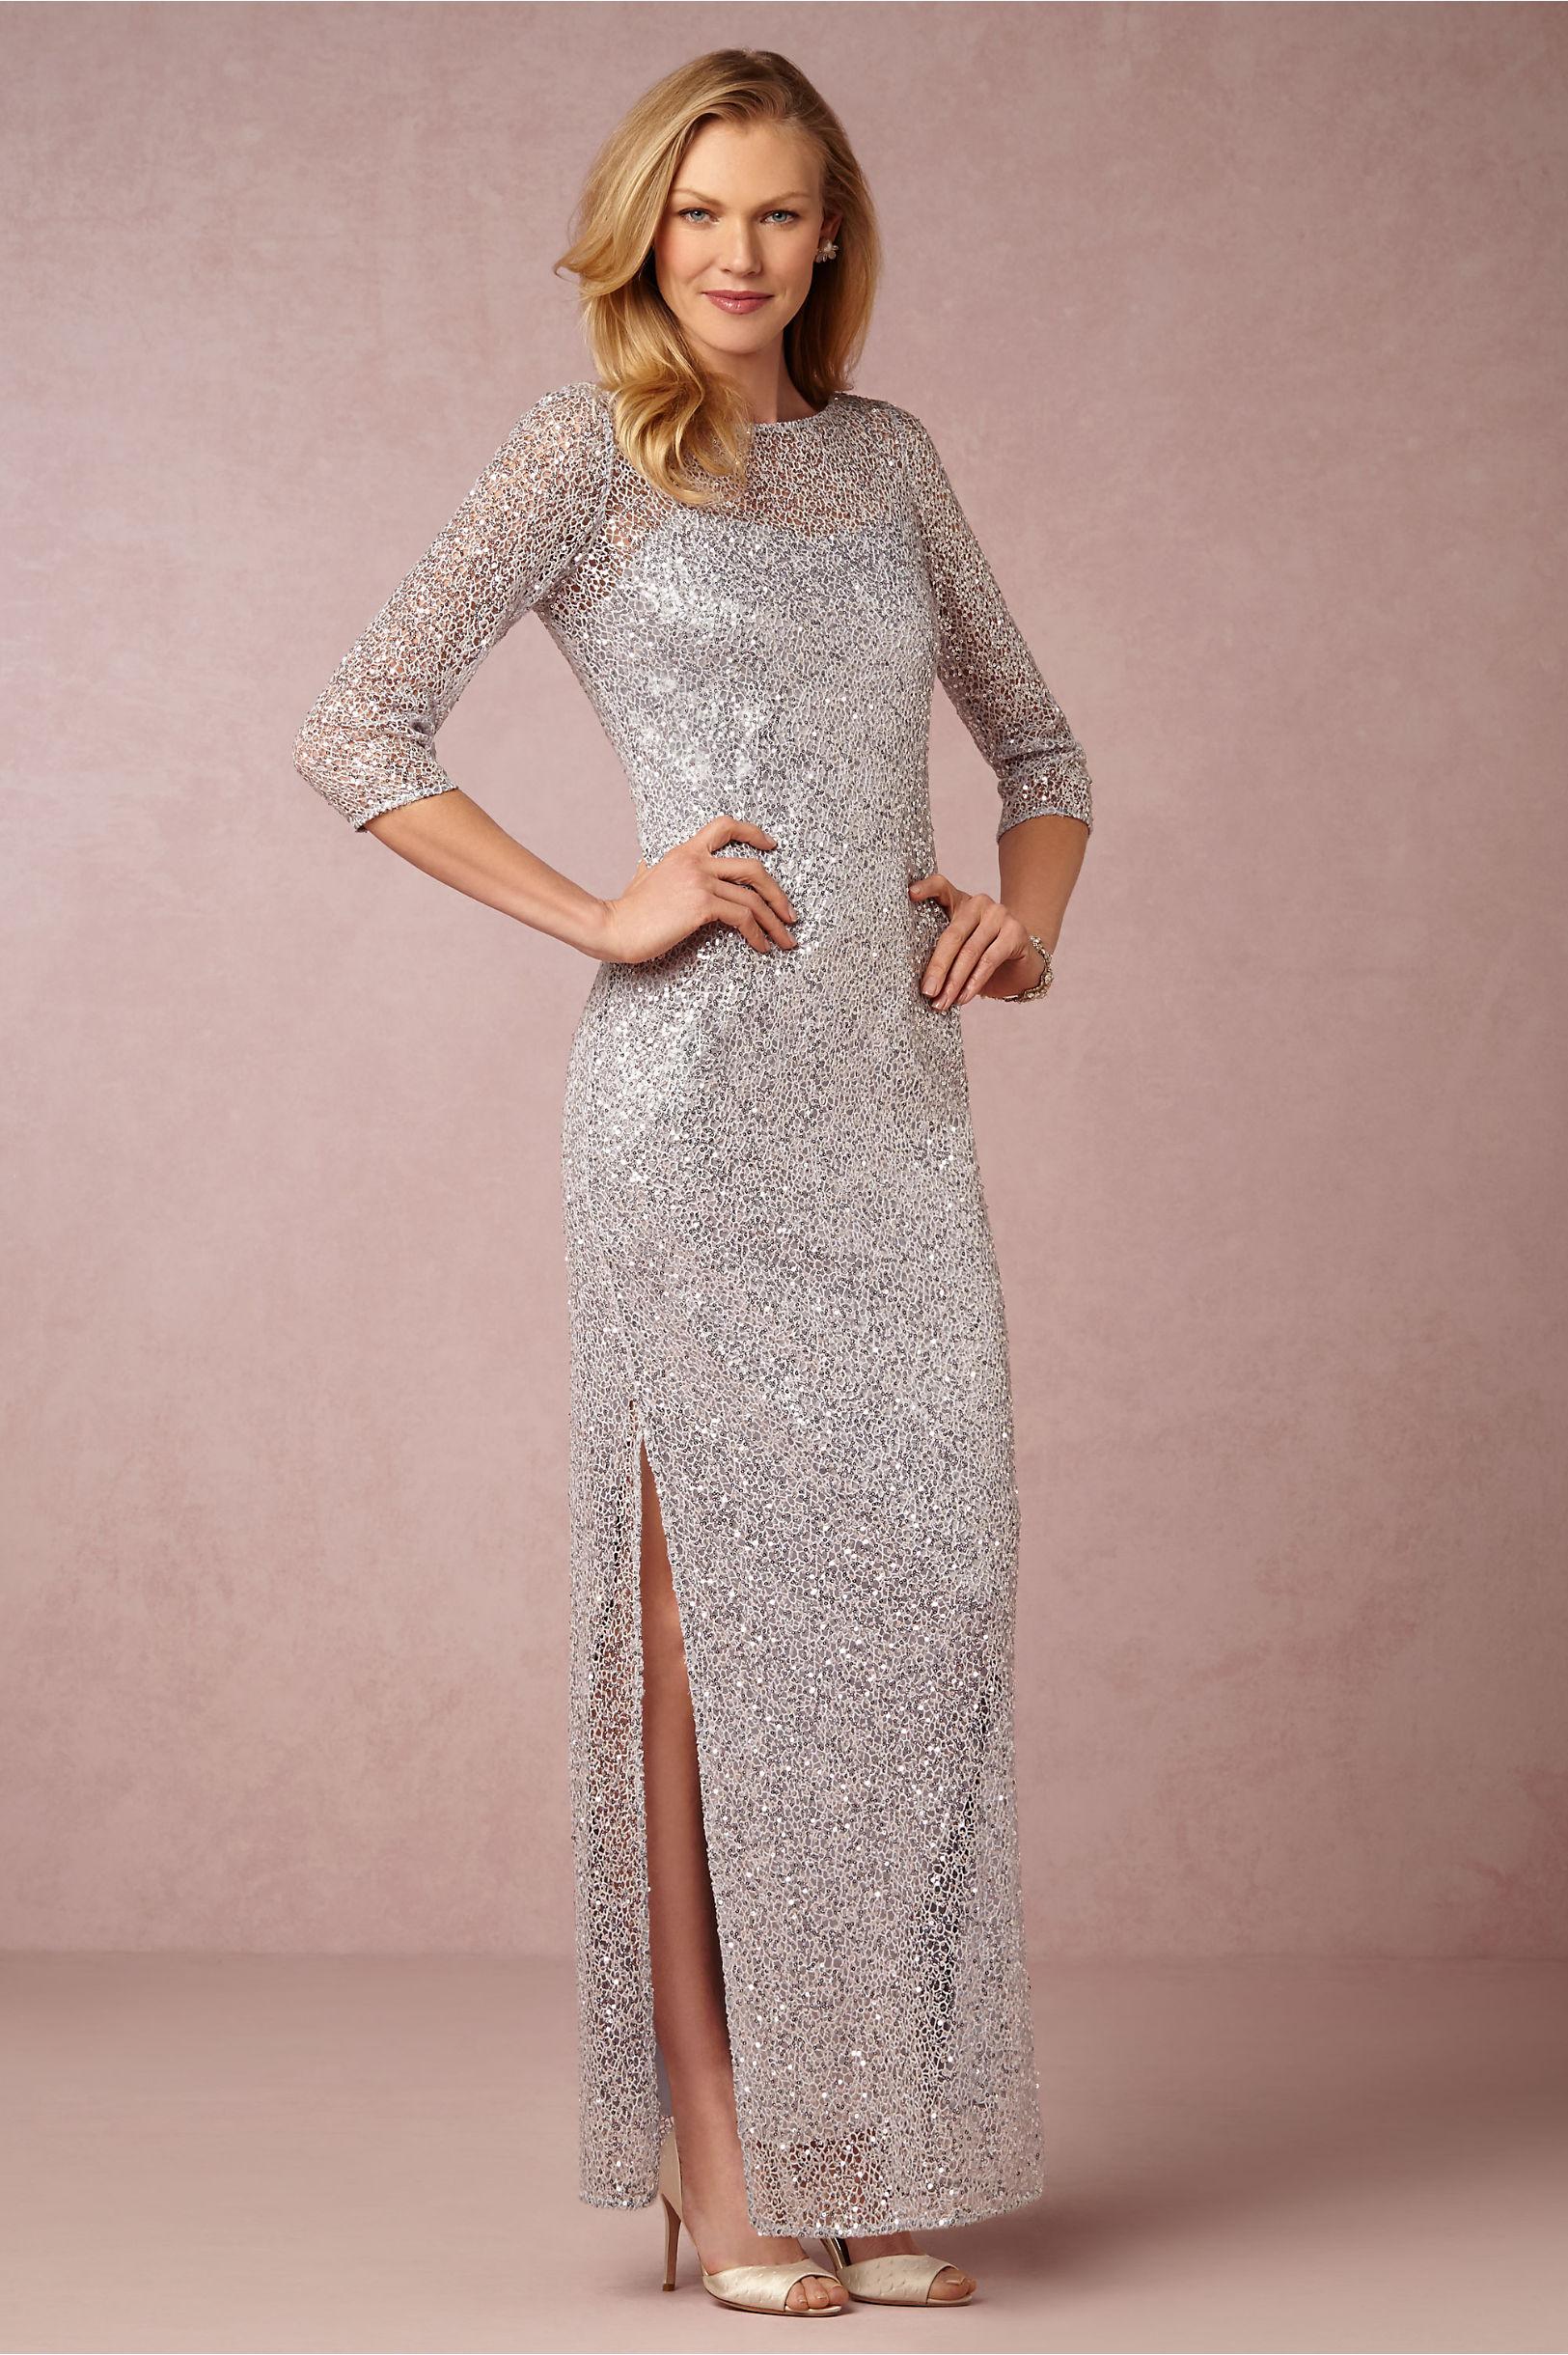 Sylvia Beaded Maxi Dress in Sale Dresses | BHLDN